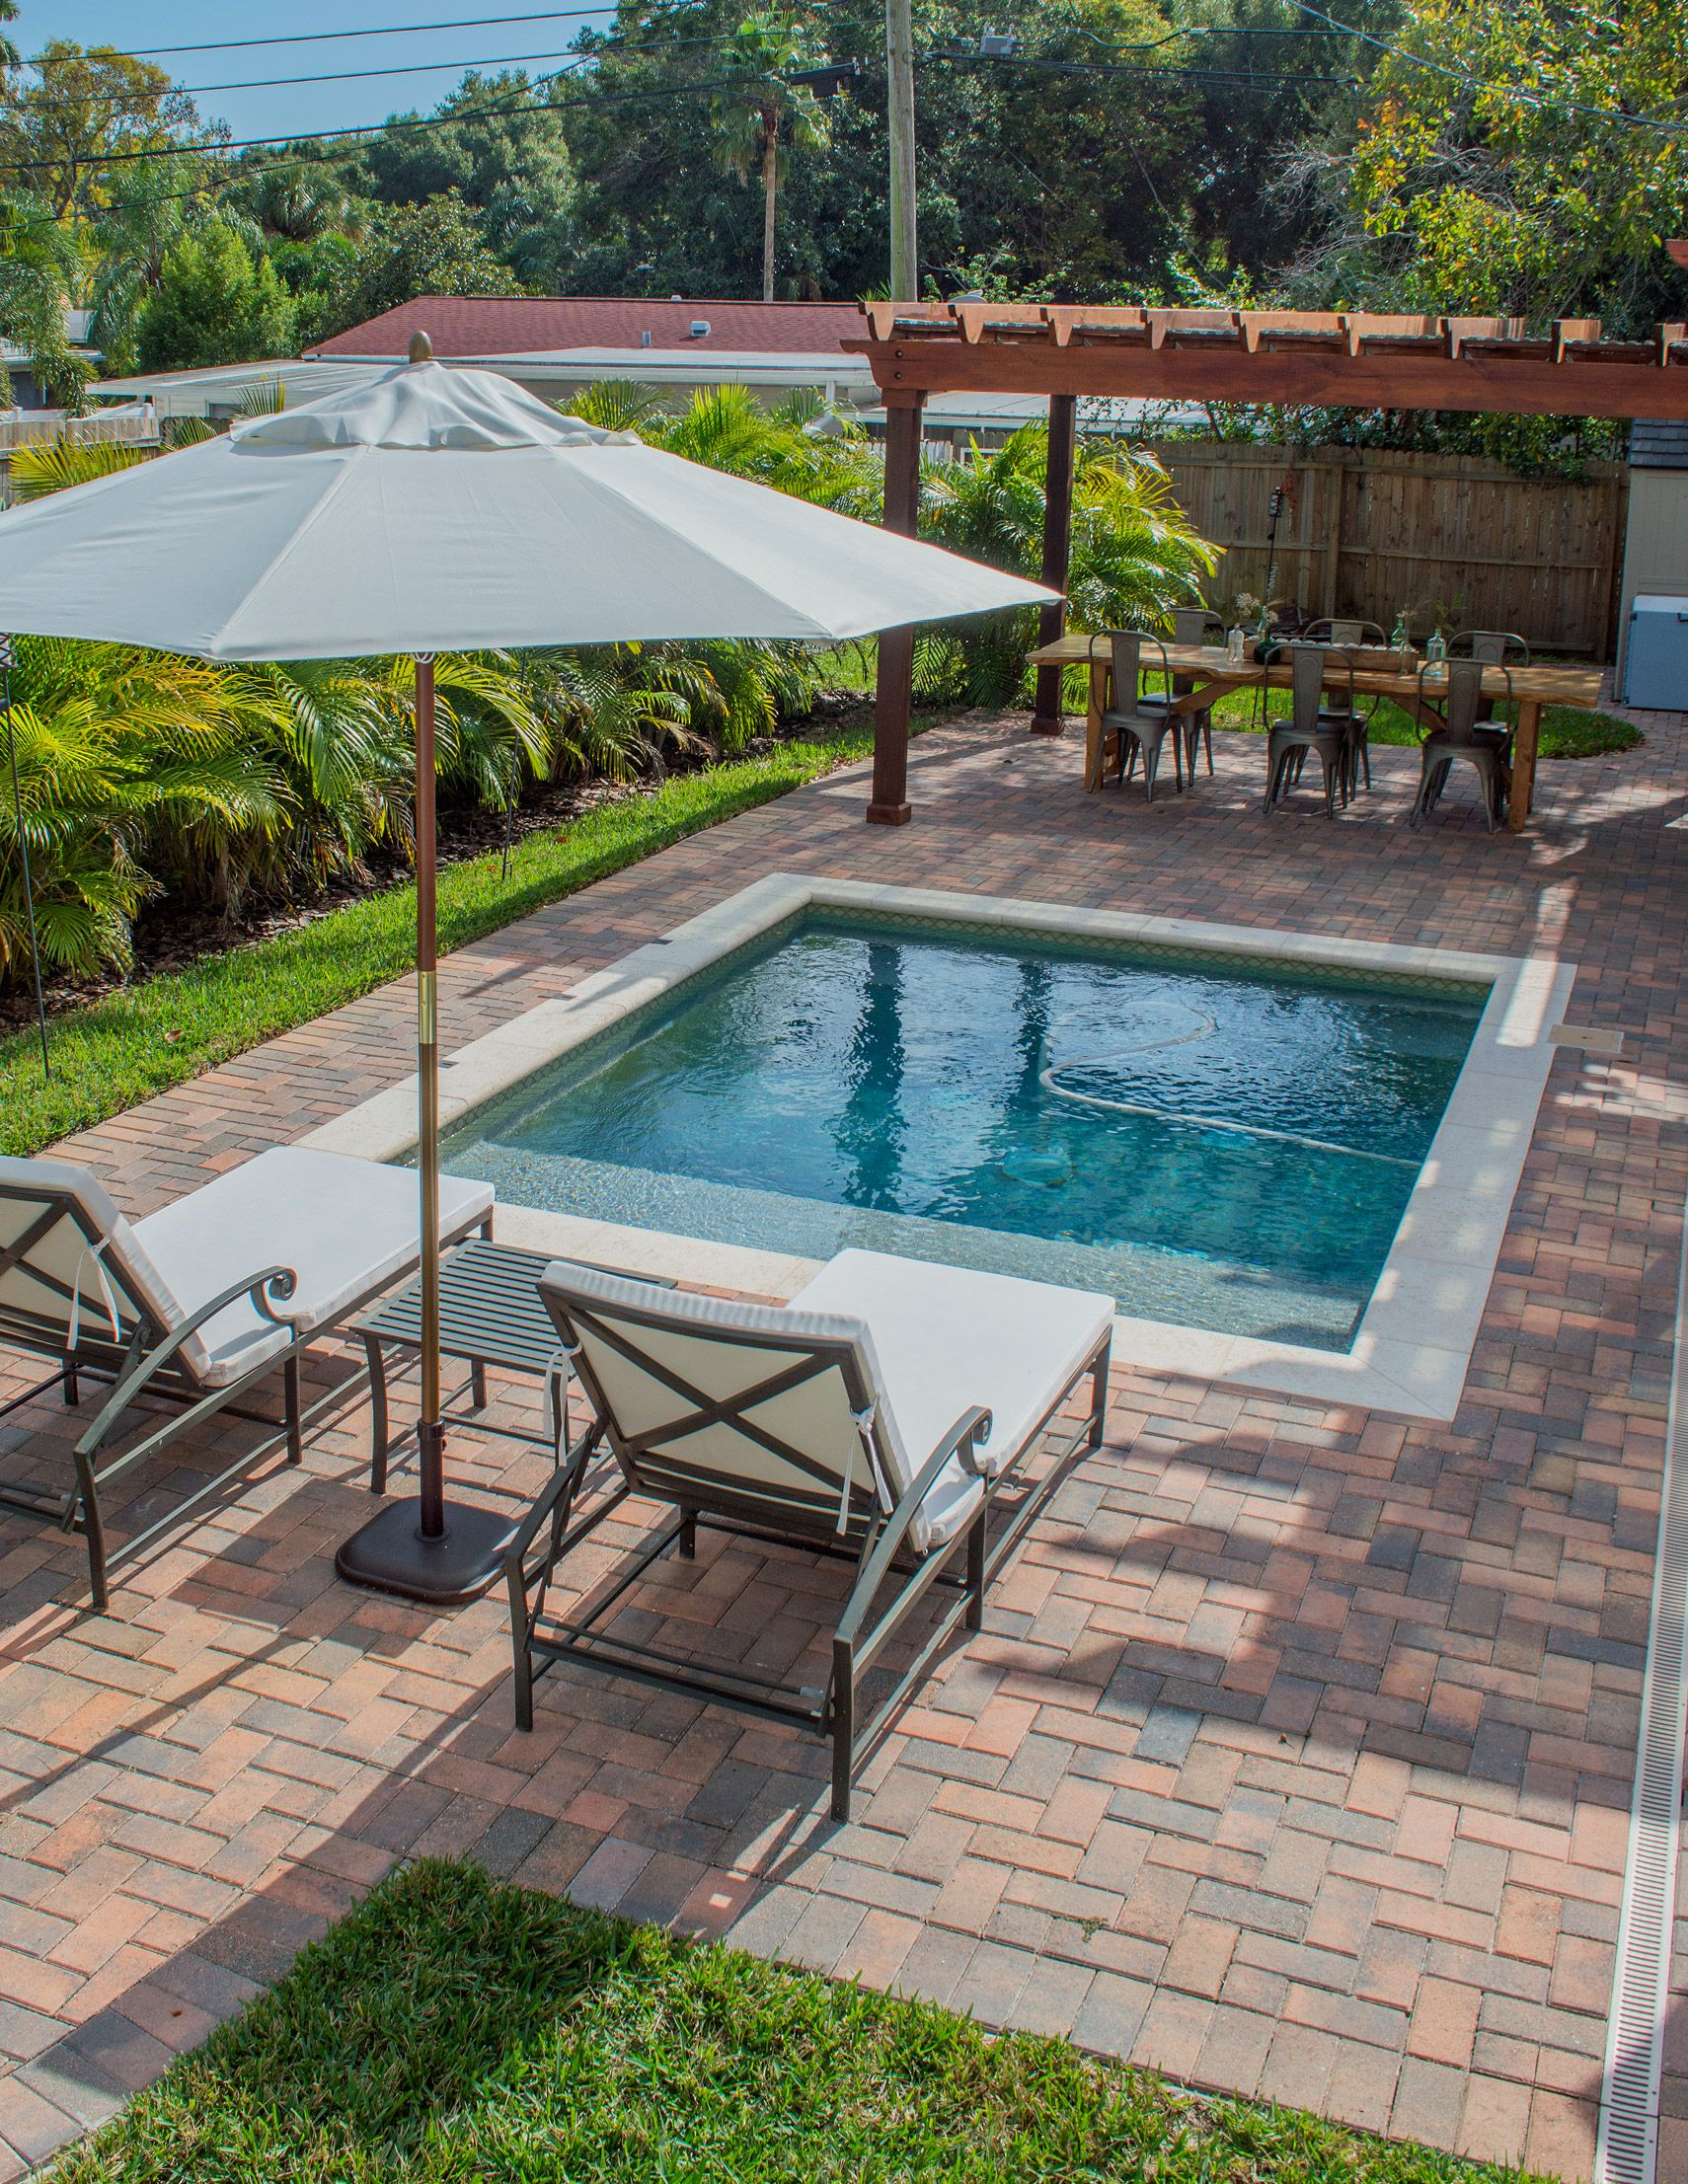 Dsc 0933 Jpg Swimming Pools Backyard Small Backyard Pools